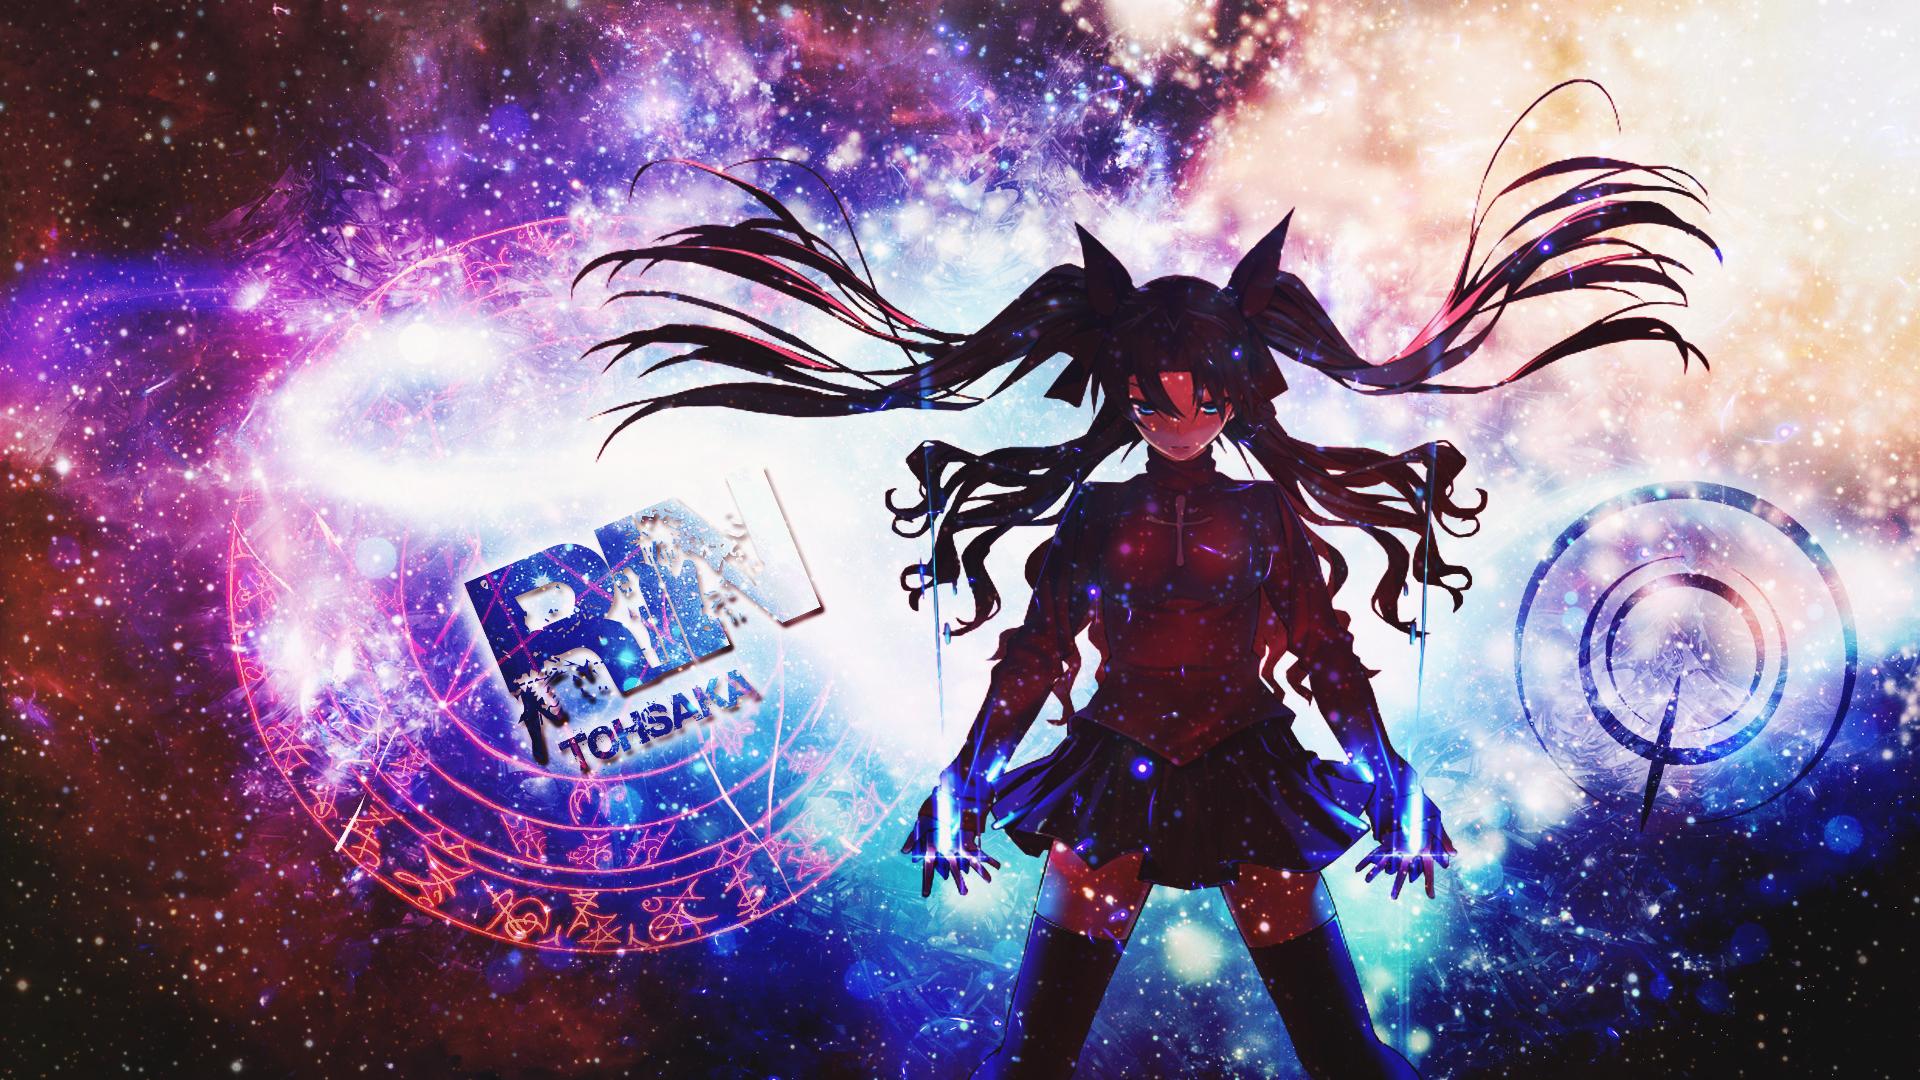 Fatestay Night Unlimited Blade Works Fondo De Pantalla Hd